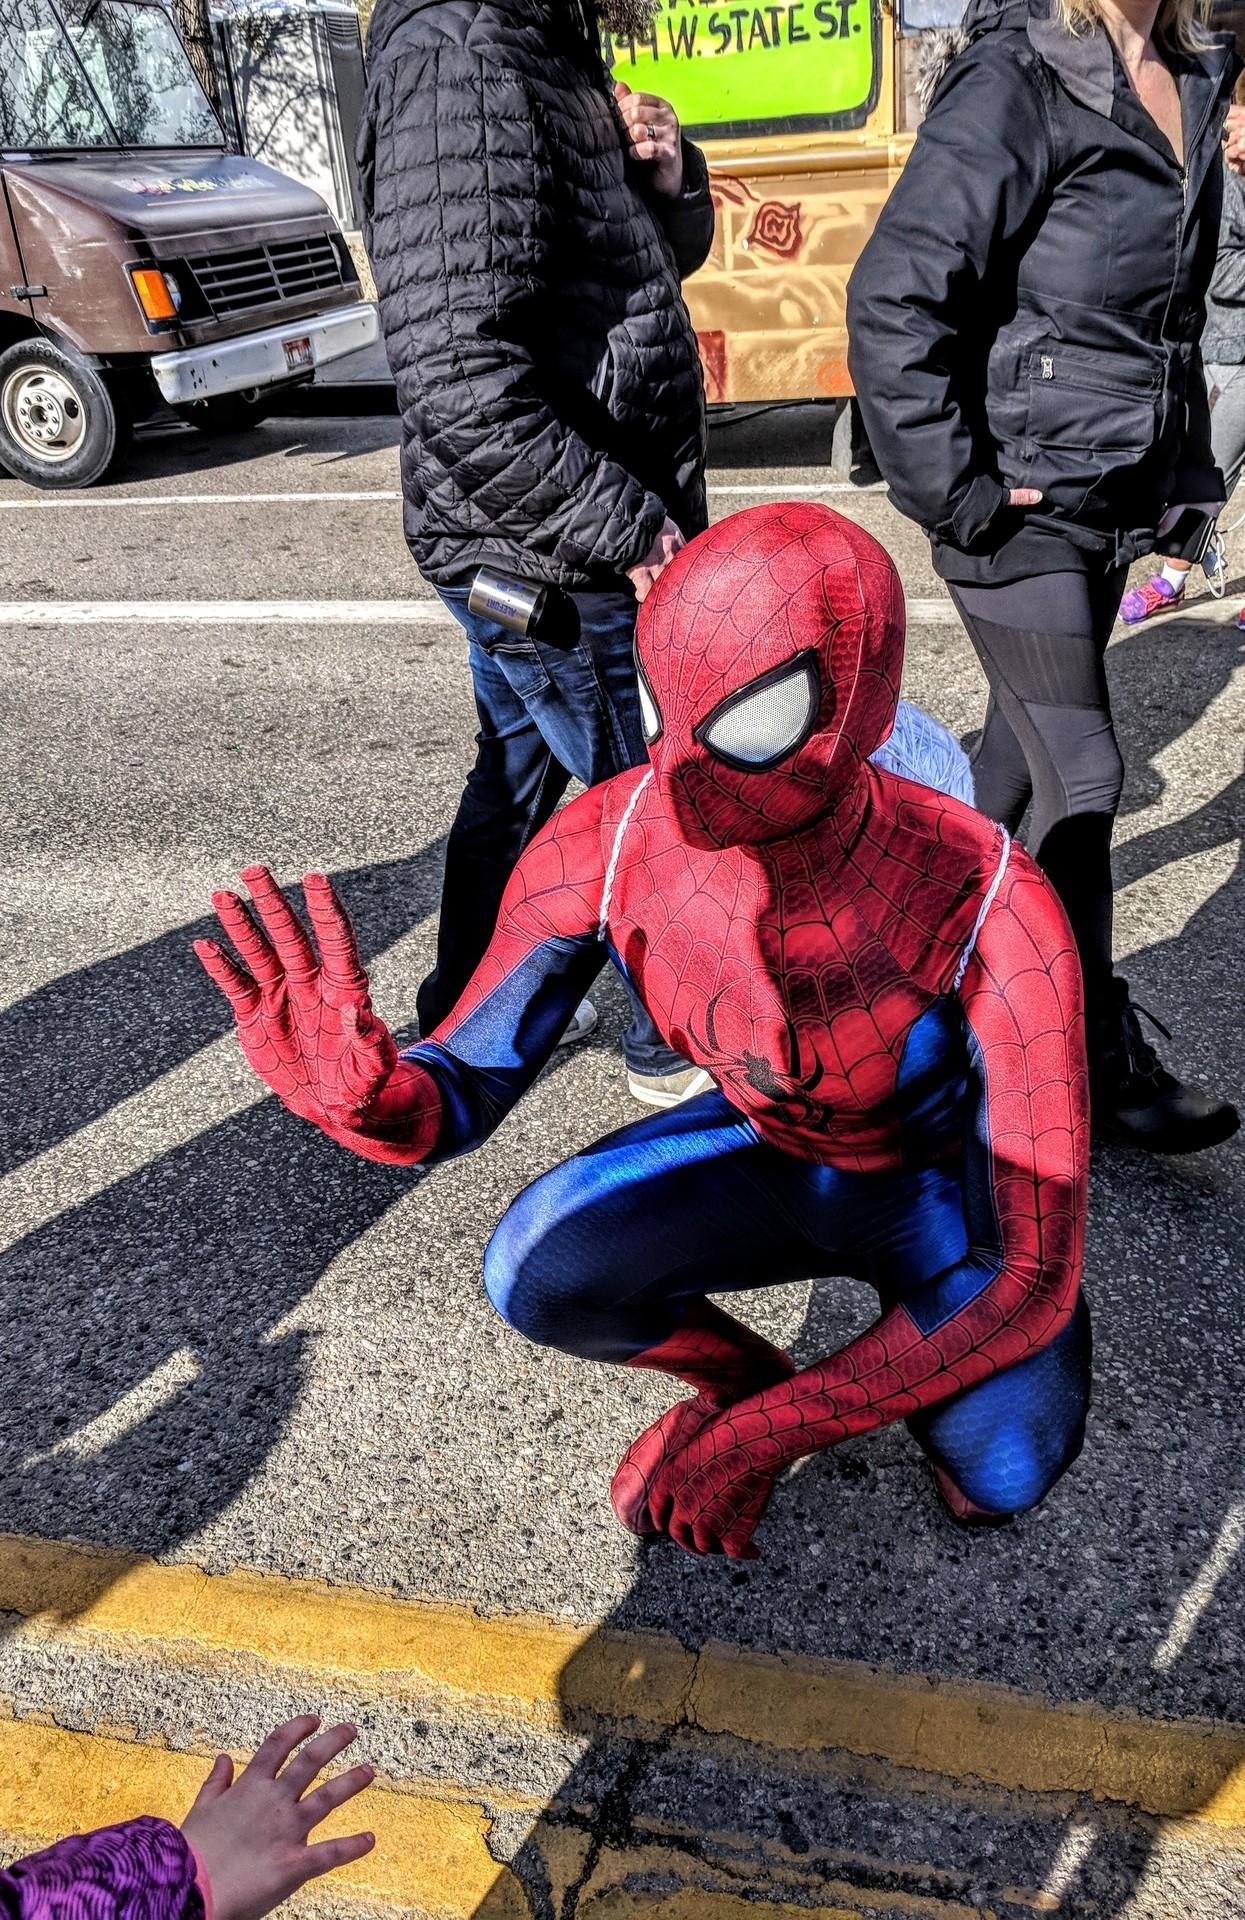 Spiderman hey! -kc